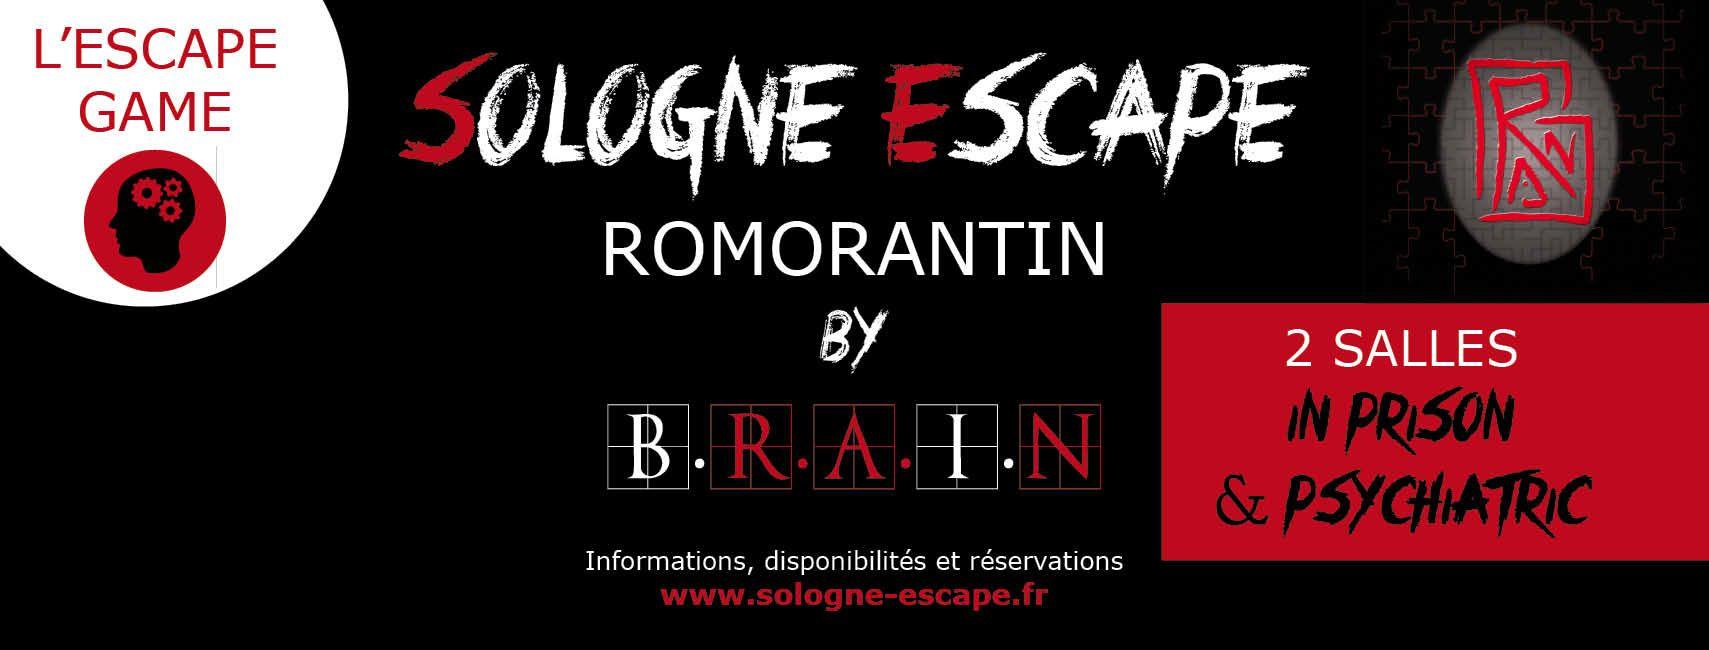 Sologne Escape